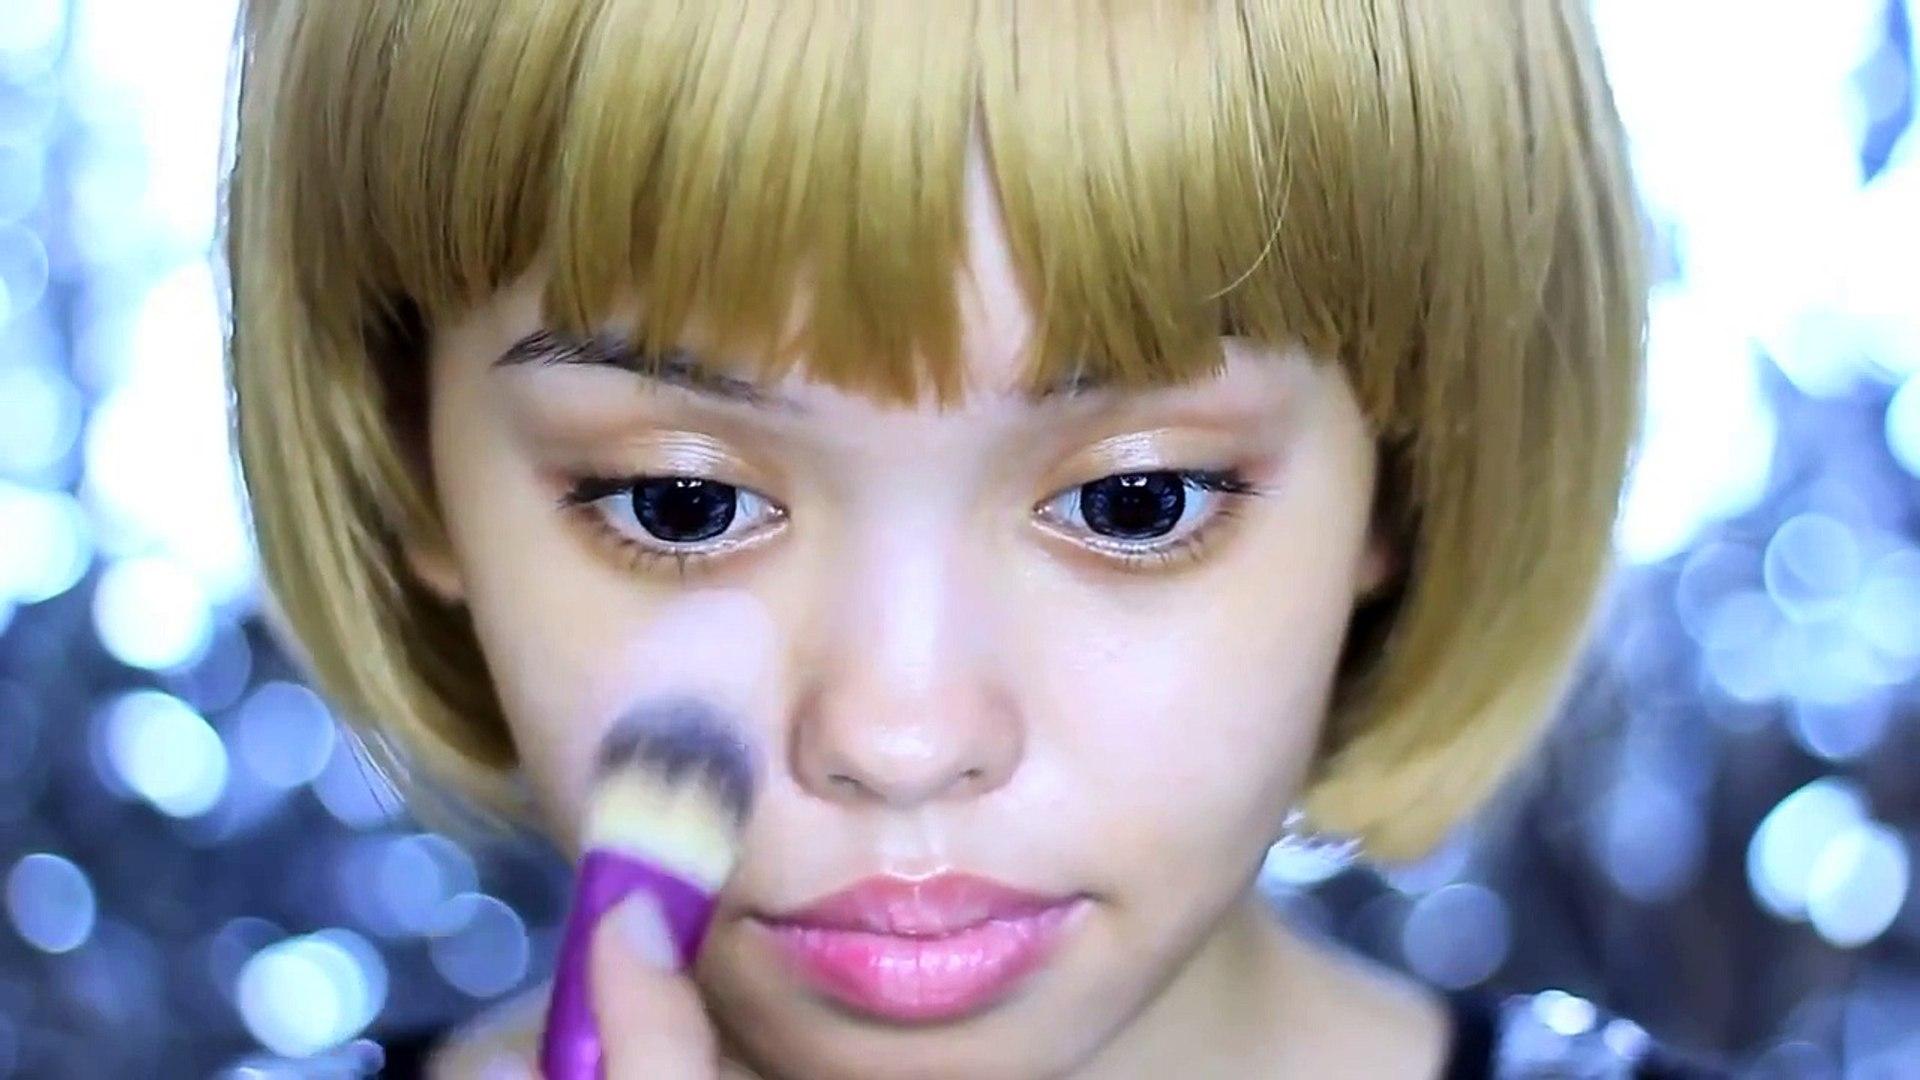 Kpop Star 2015:Makeup Tutorial How To Look Like A Kpop Star